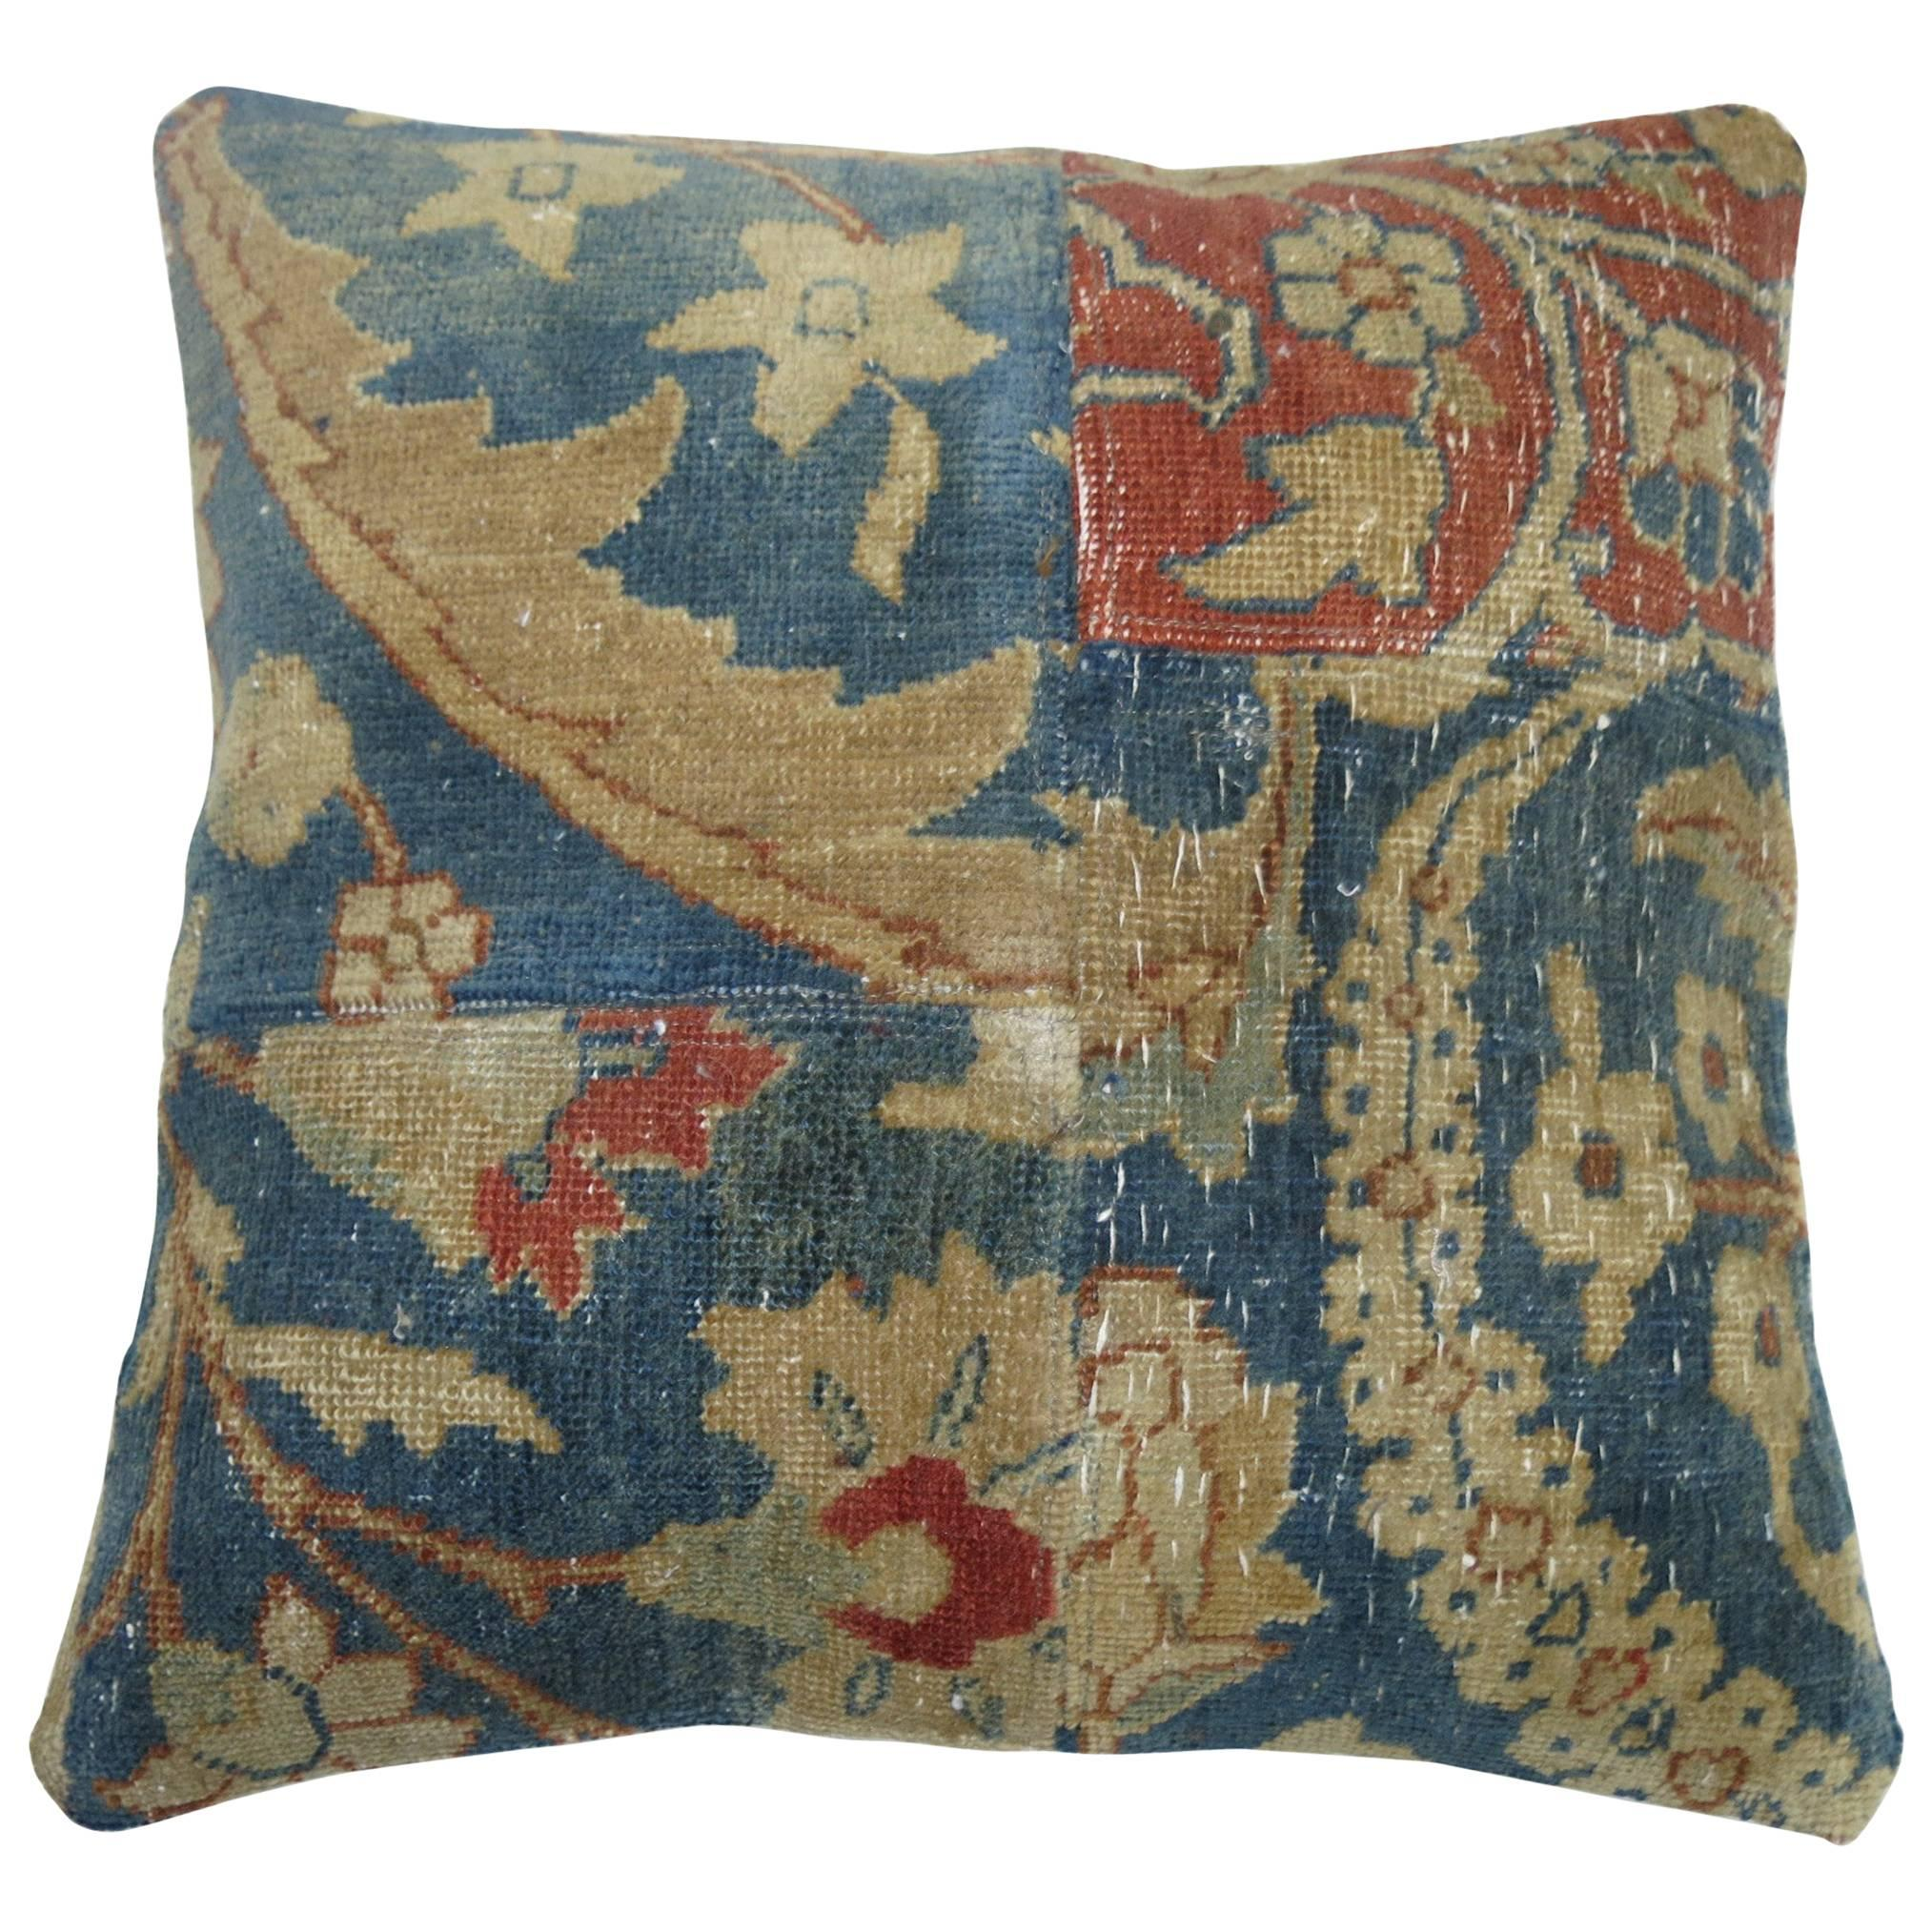 Tabriz Patchwork Rug Pillow